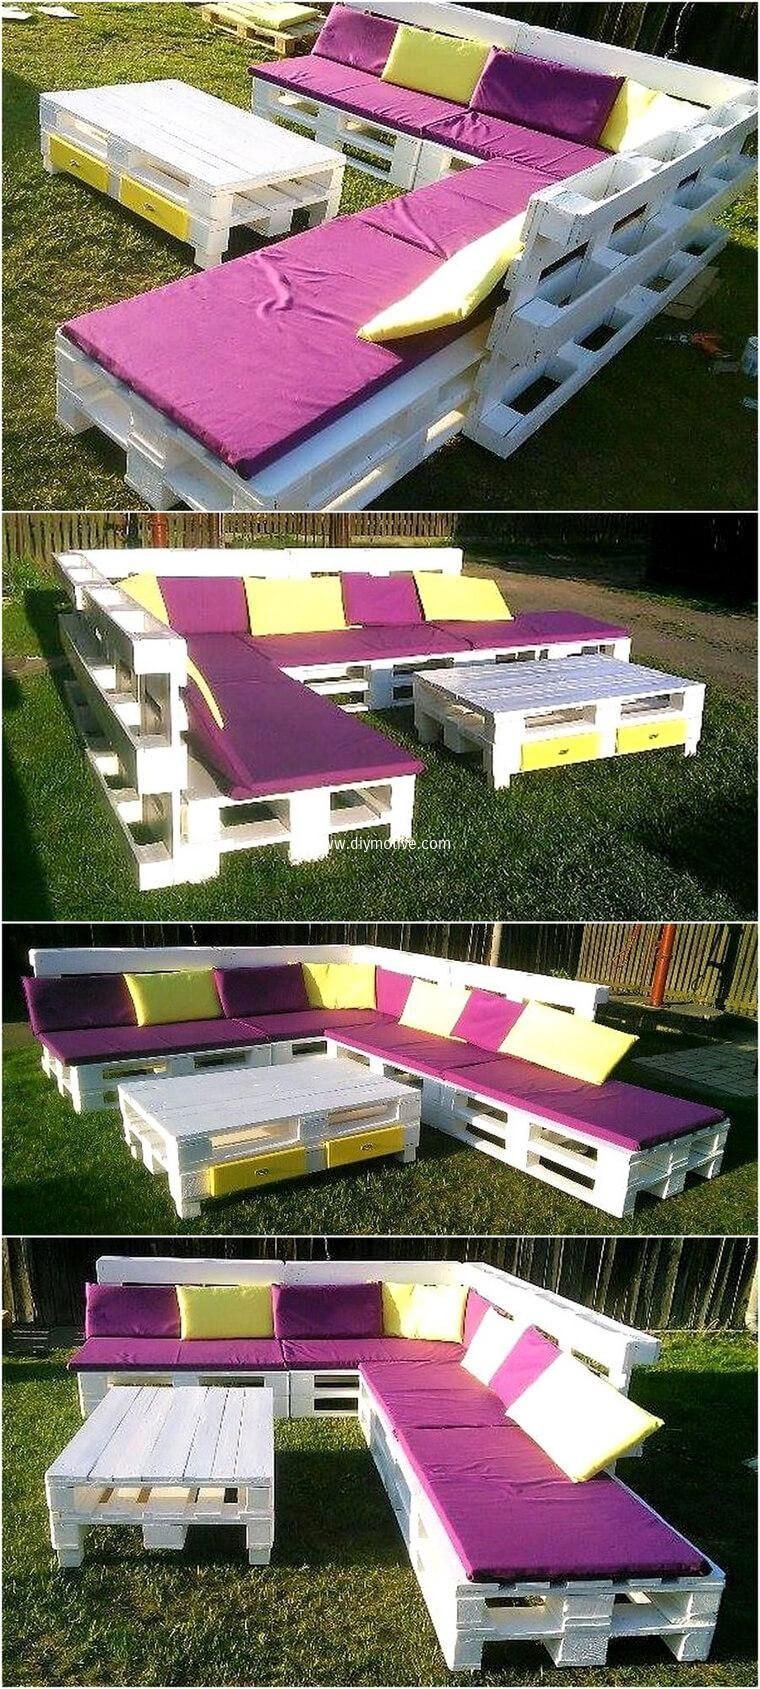 Brilliant Pallets Repurposing Ideas For Your Home Improvement